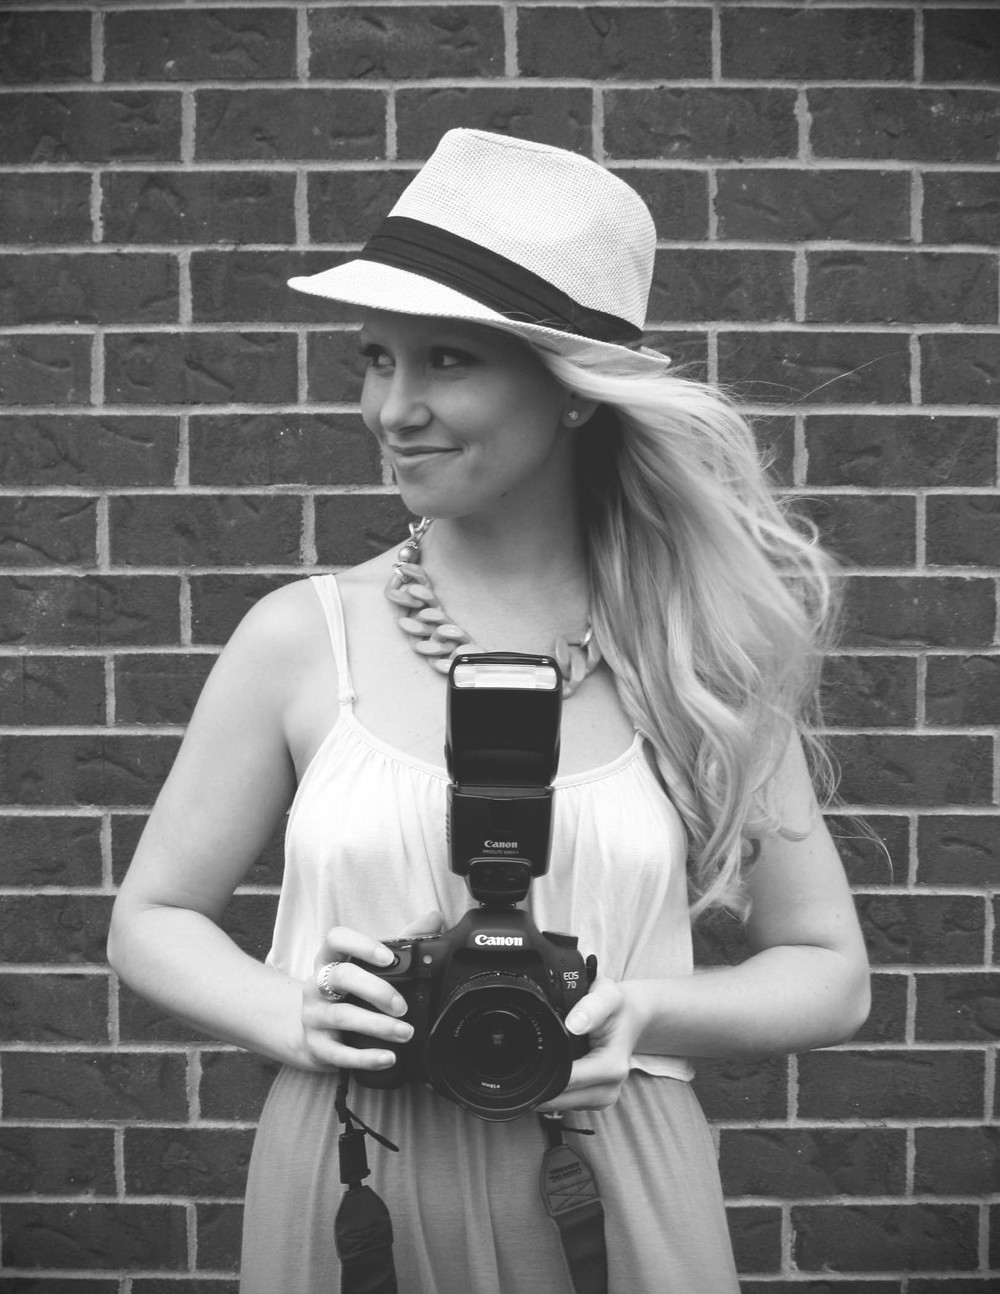 Owner: Megan Benish, 2013